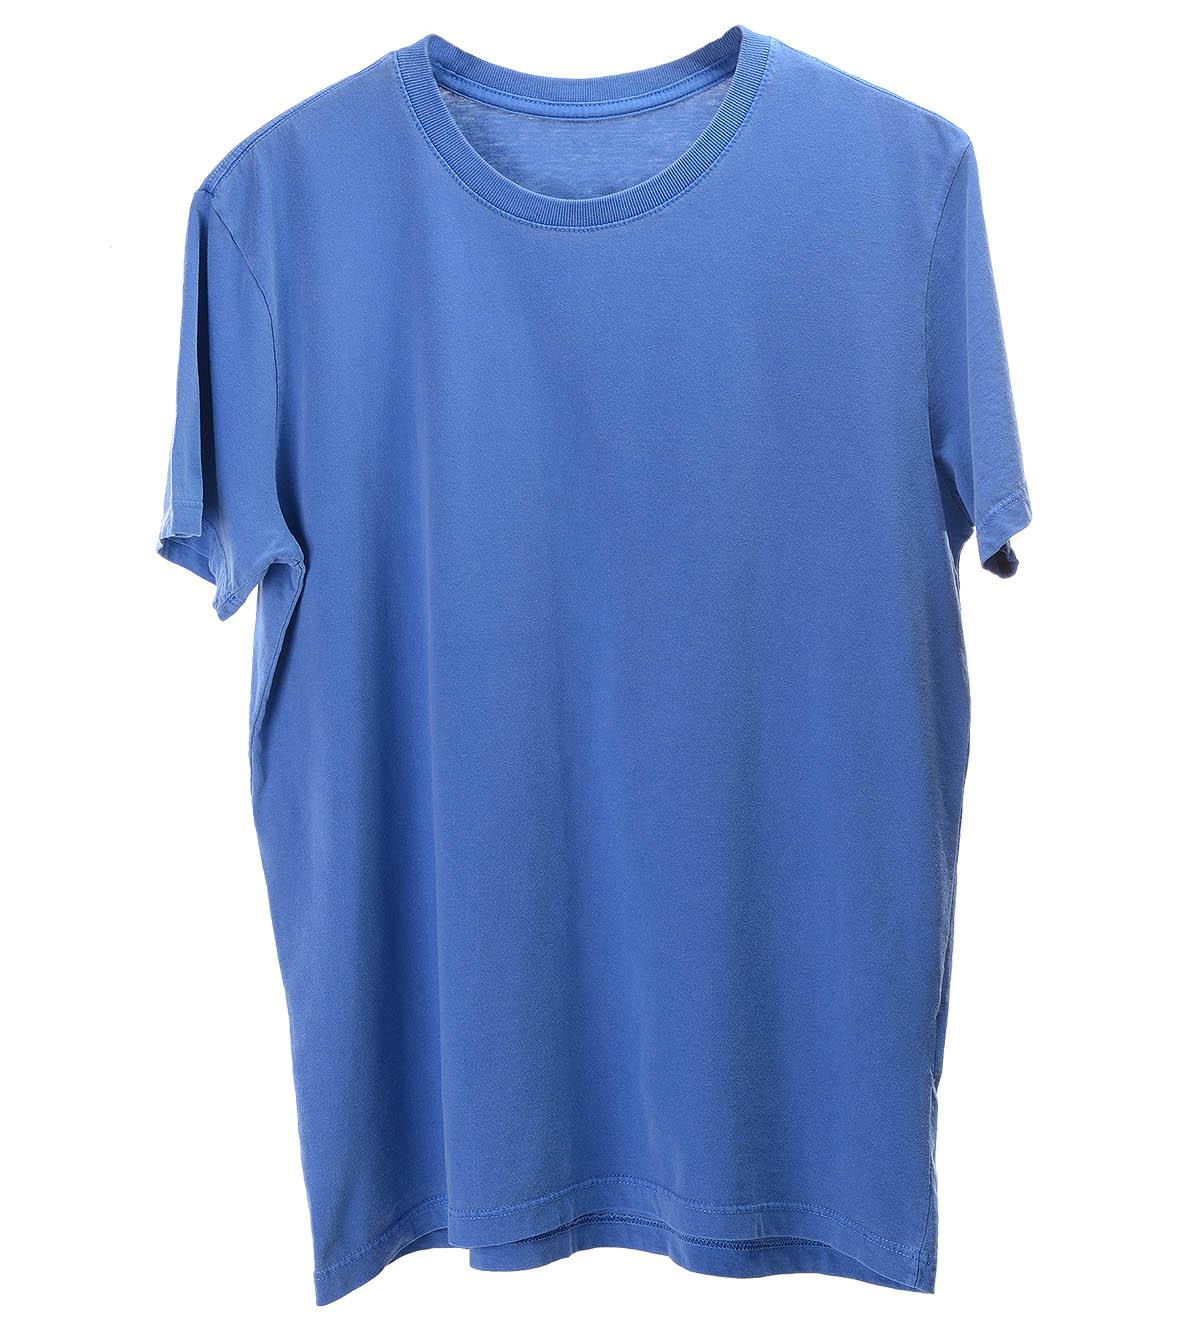 Camiseta lisa estonada azul